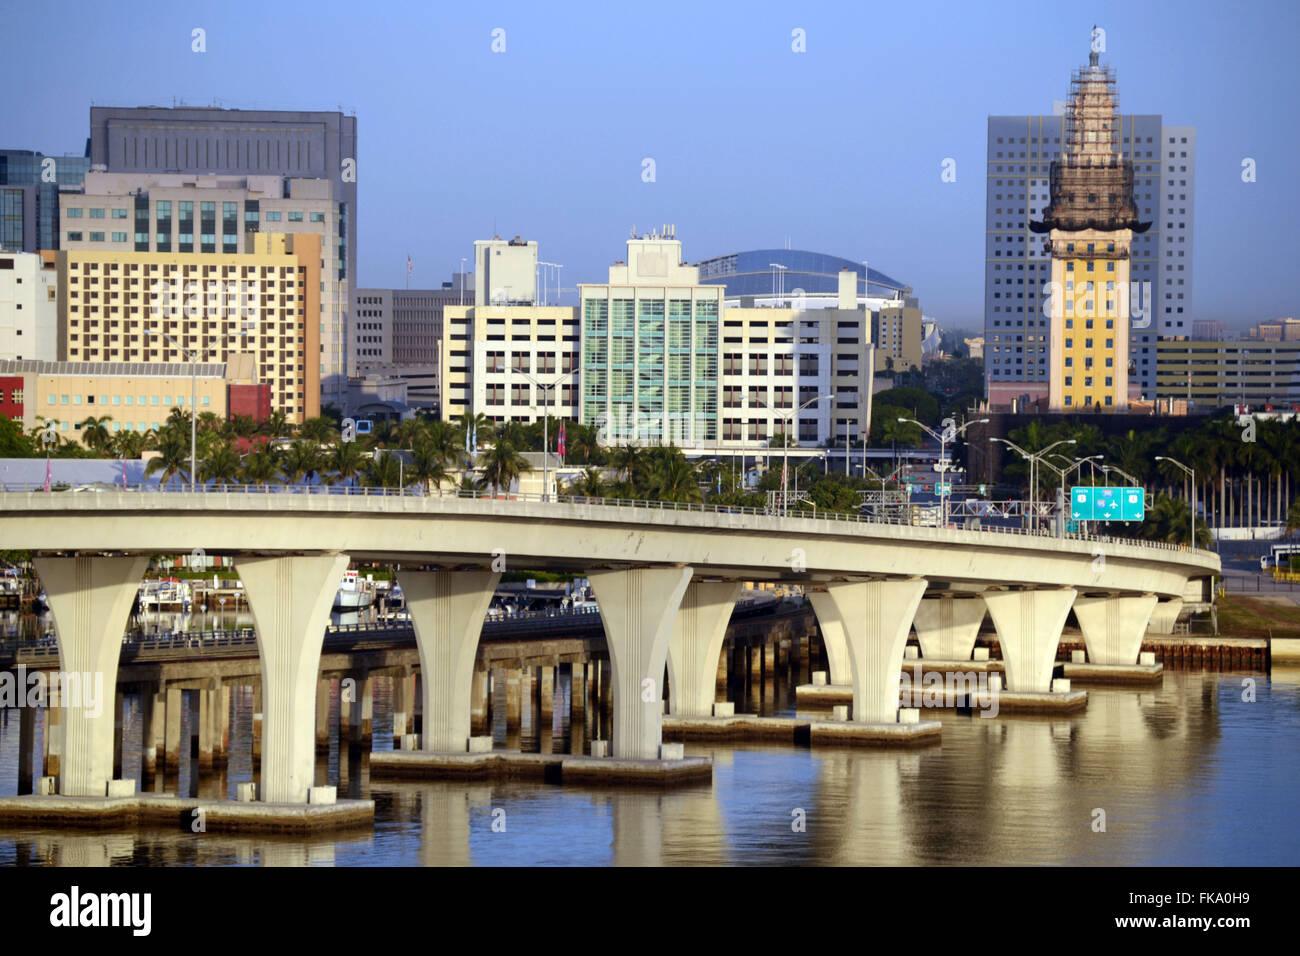 City of Miami - Florida State - USA - Stock Image